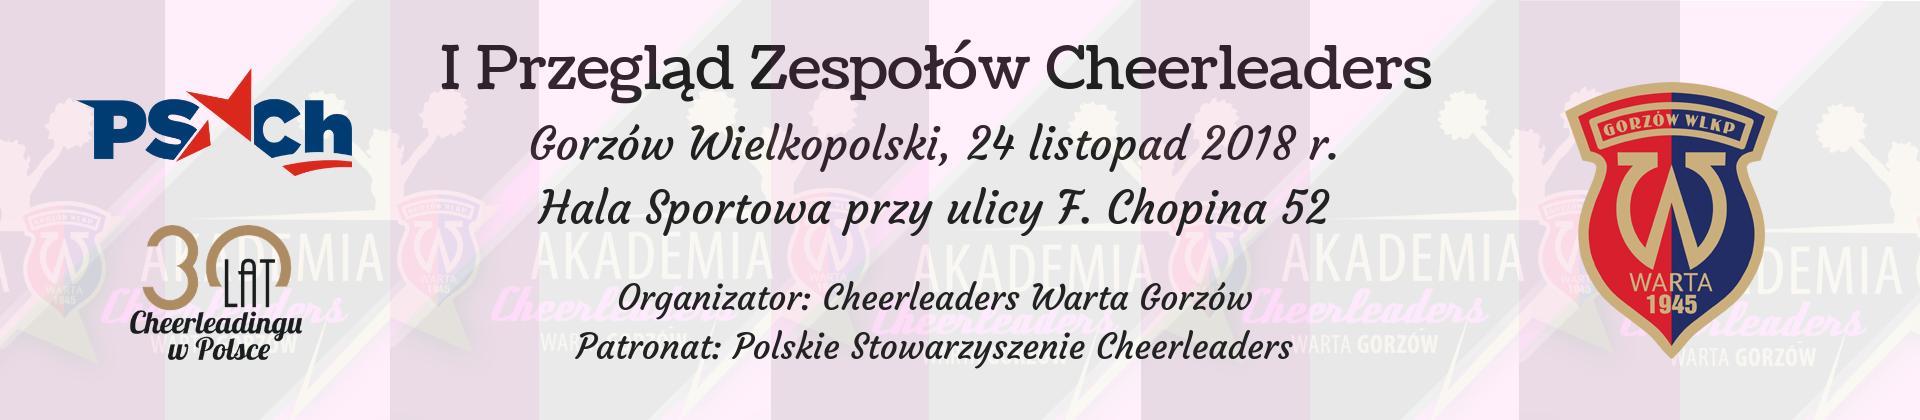 Grand Prix Polski Cheerleaders 2018 (5)